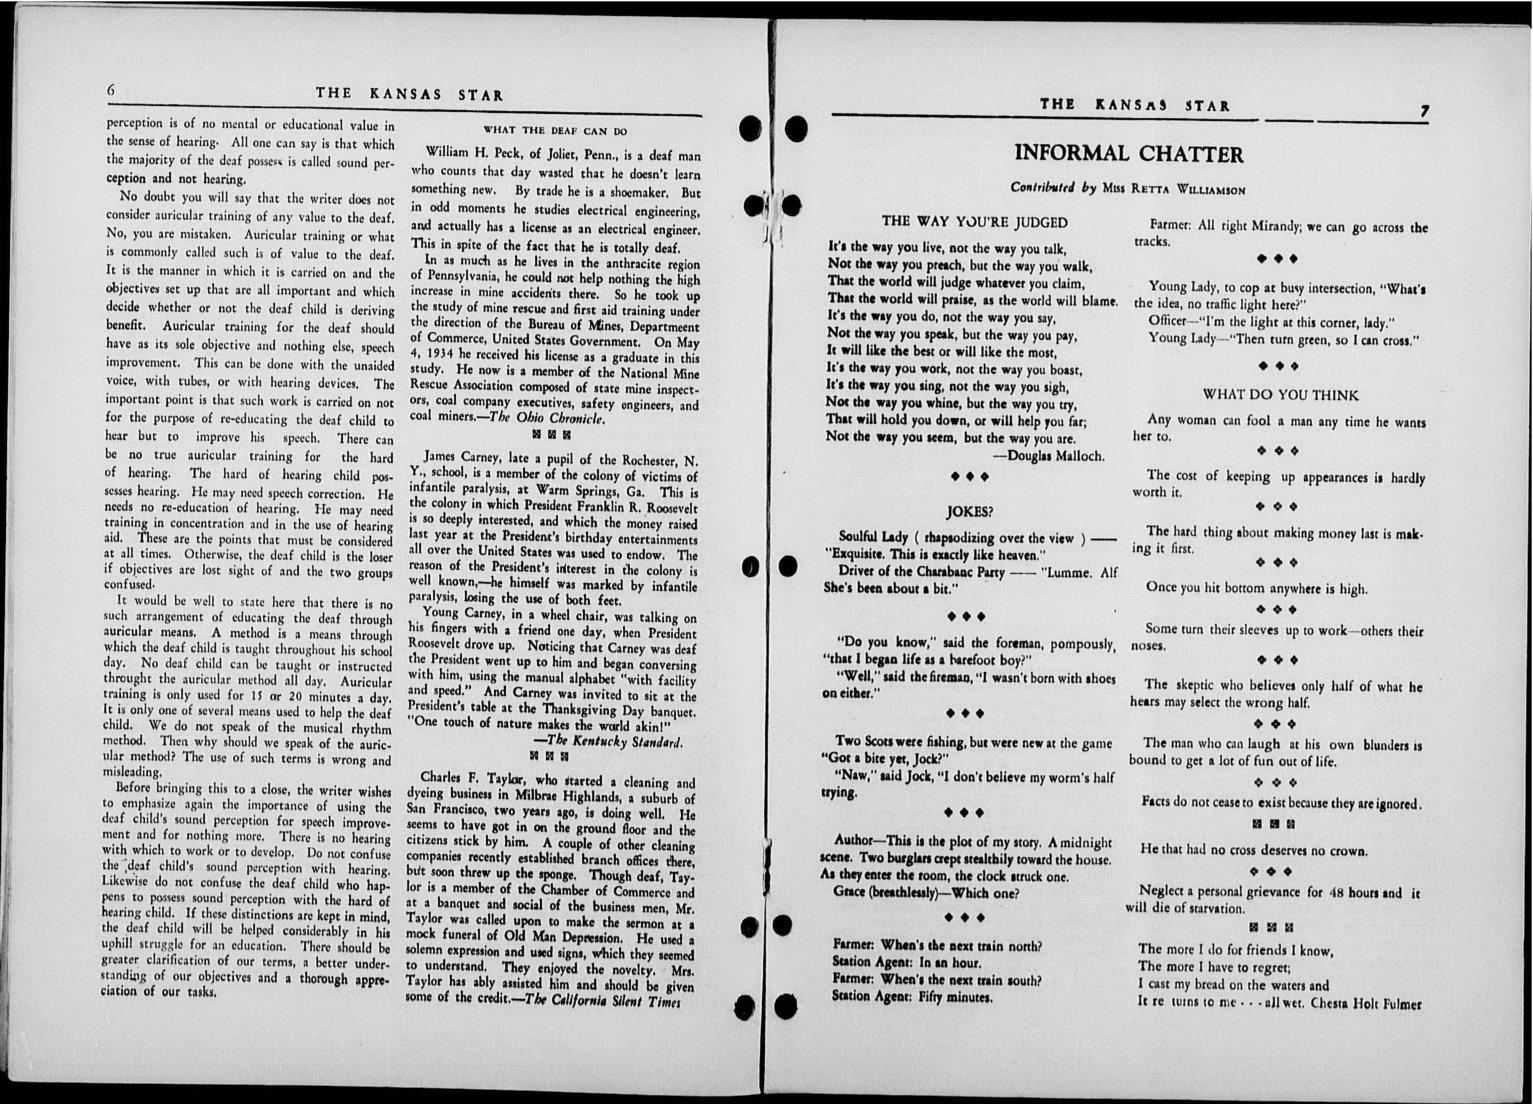 The Kansas Star, volume 50, number 8 - 6-7